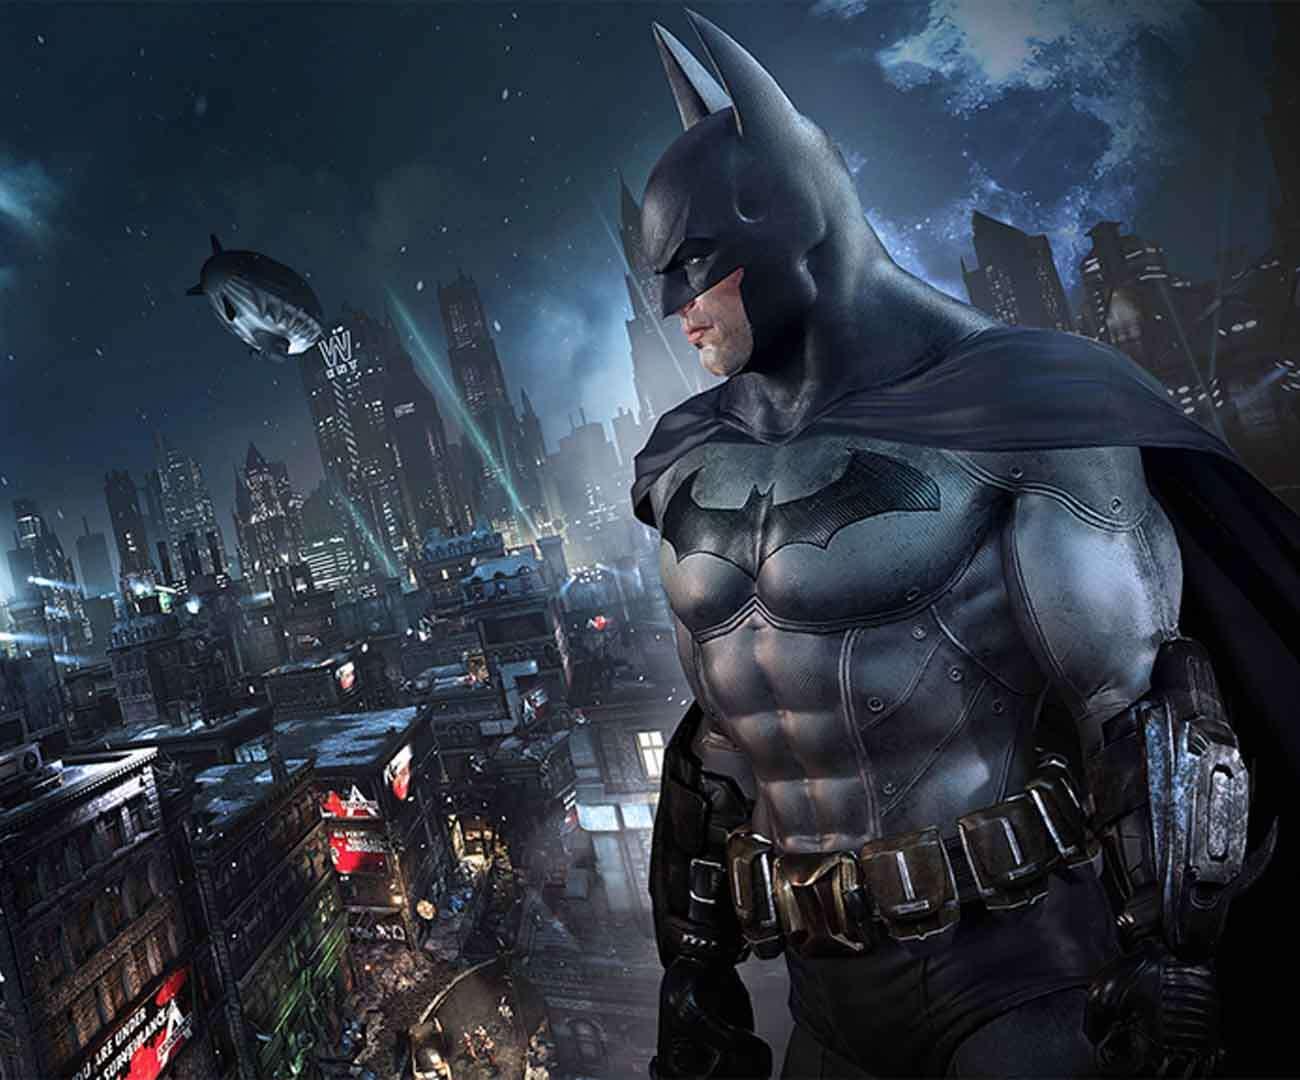 gotham knights, batman